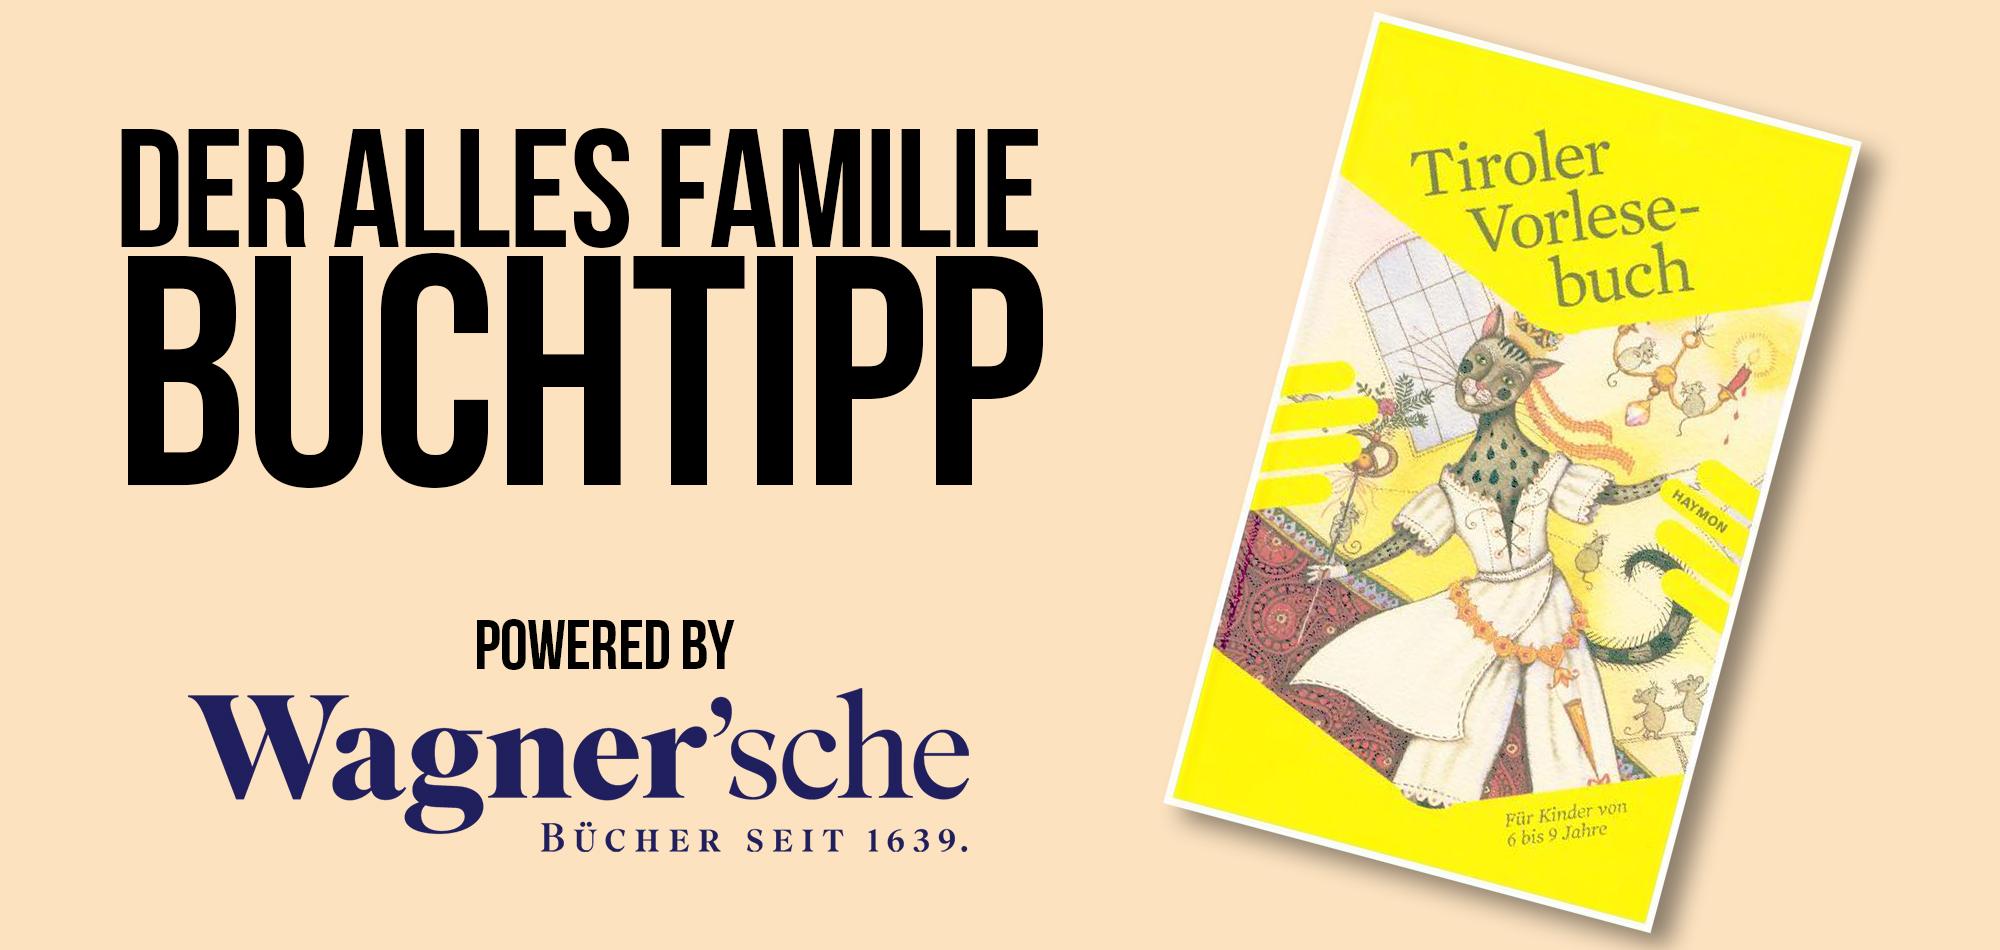 Das Tiroler Vorlesebuch Band 2